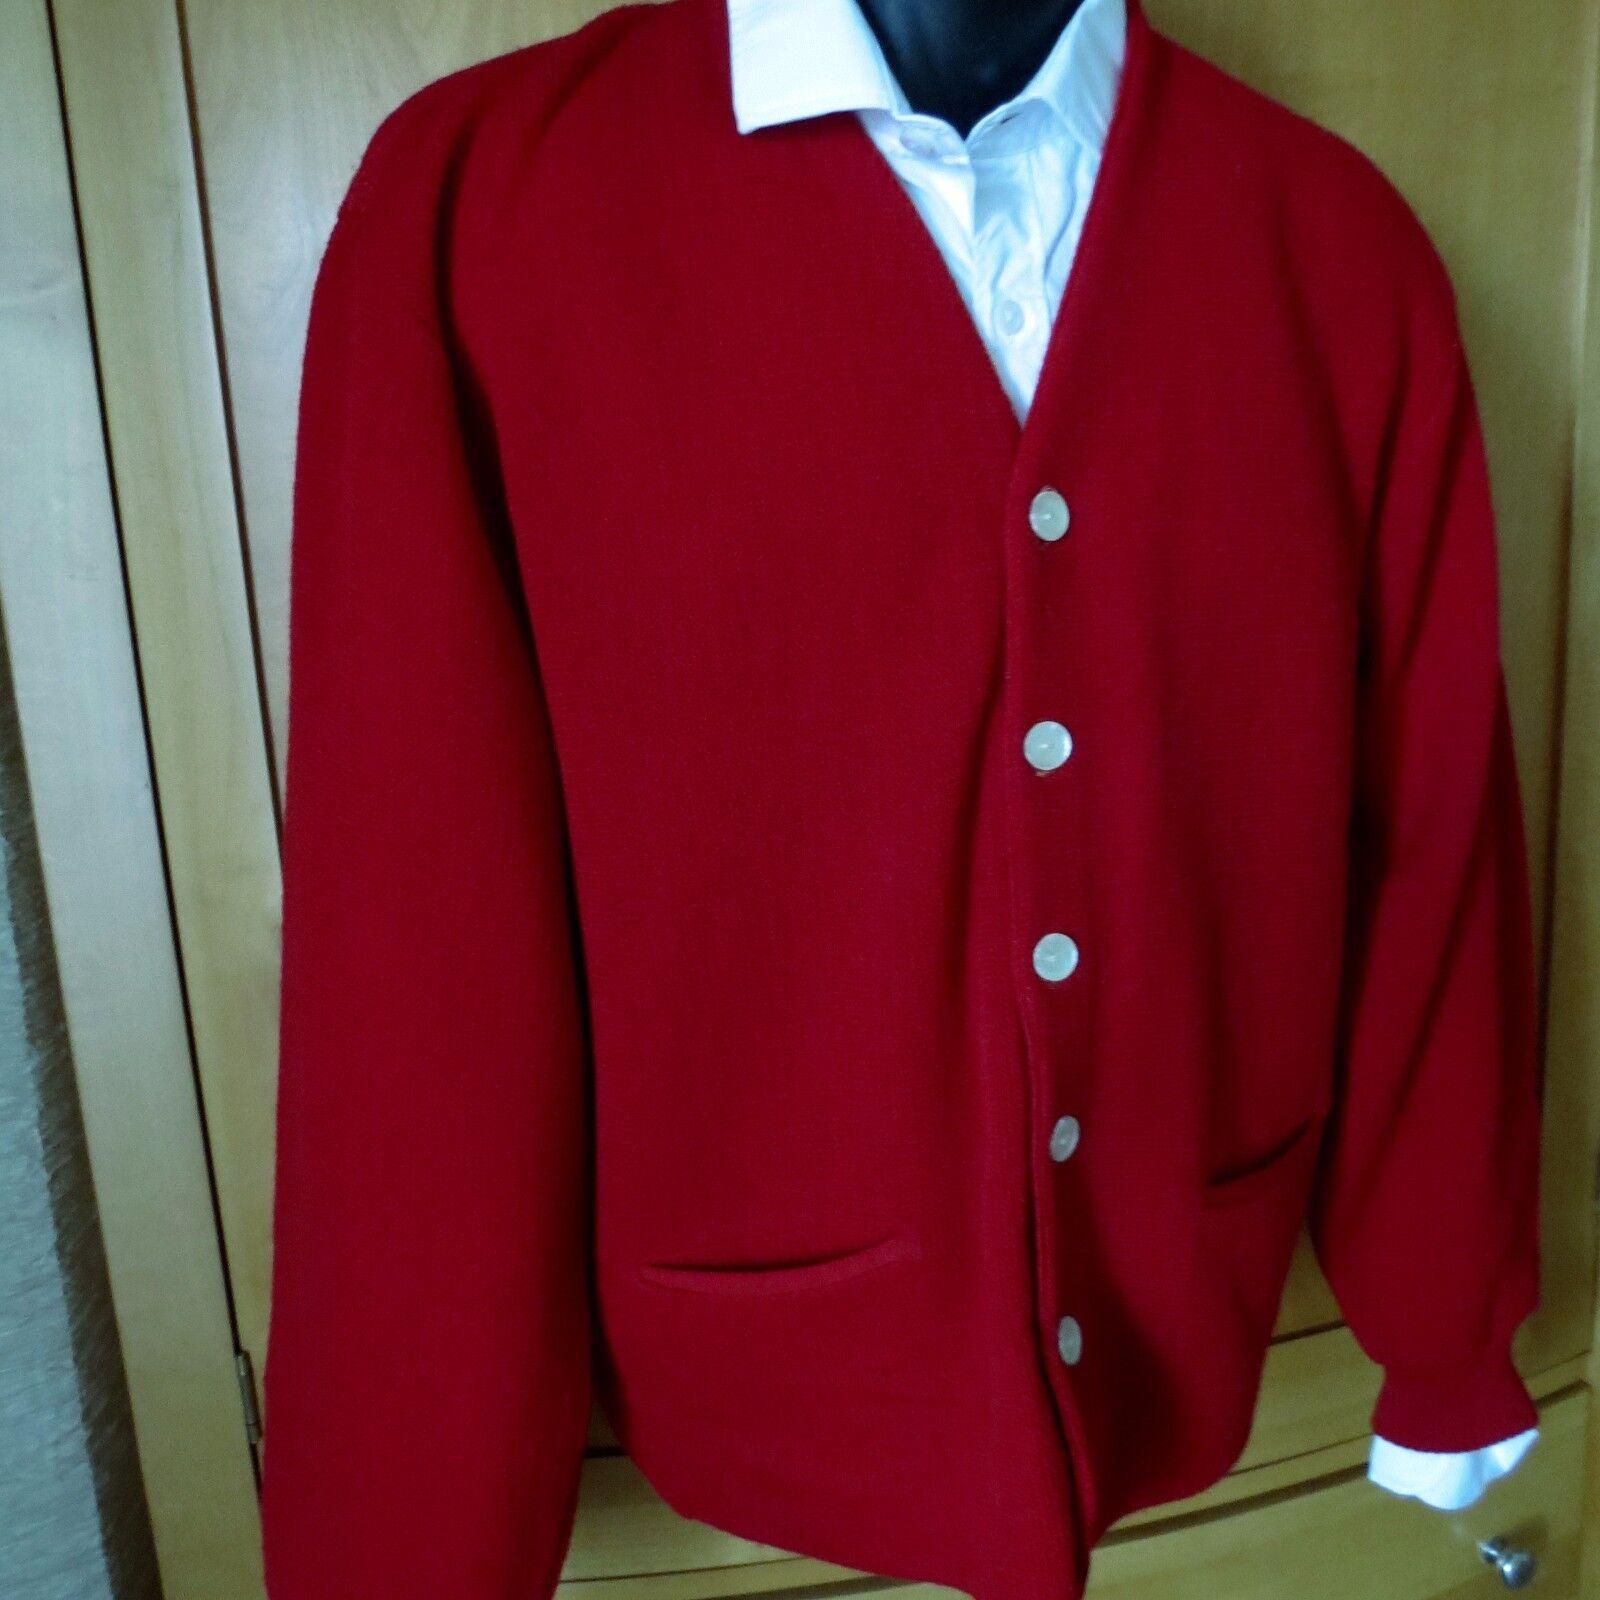 Vtg 60s Jantzen 100% Wool Cardigan Sweater Herren Hipster  Preppy Grunge L. EEUC